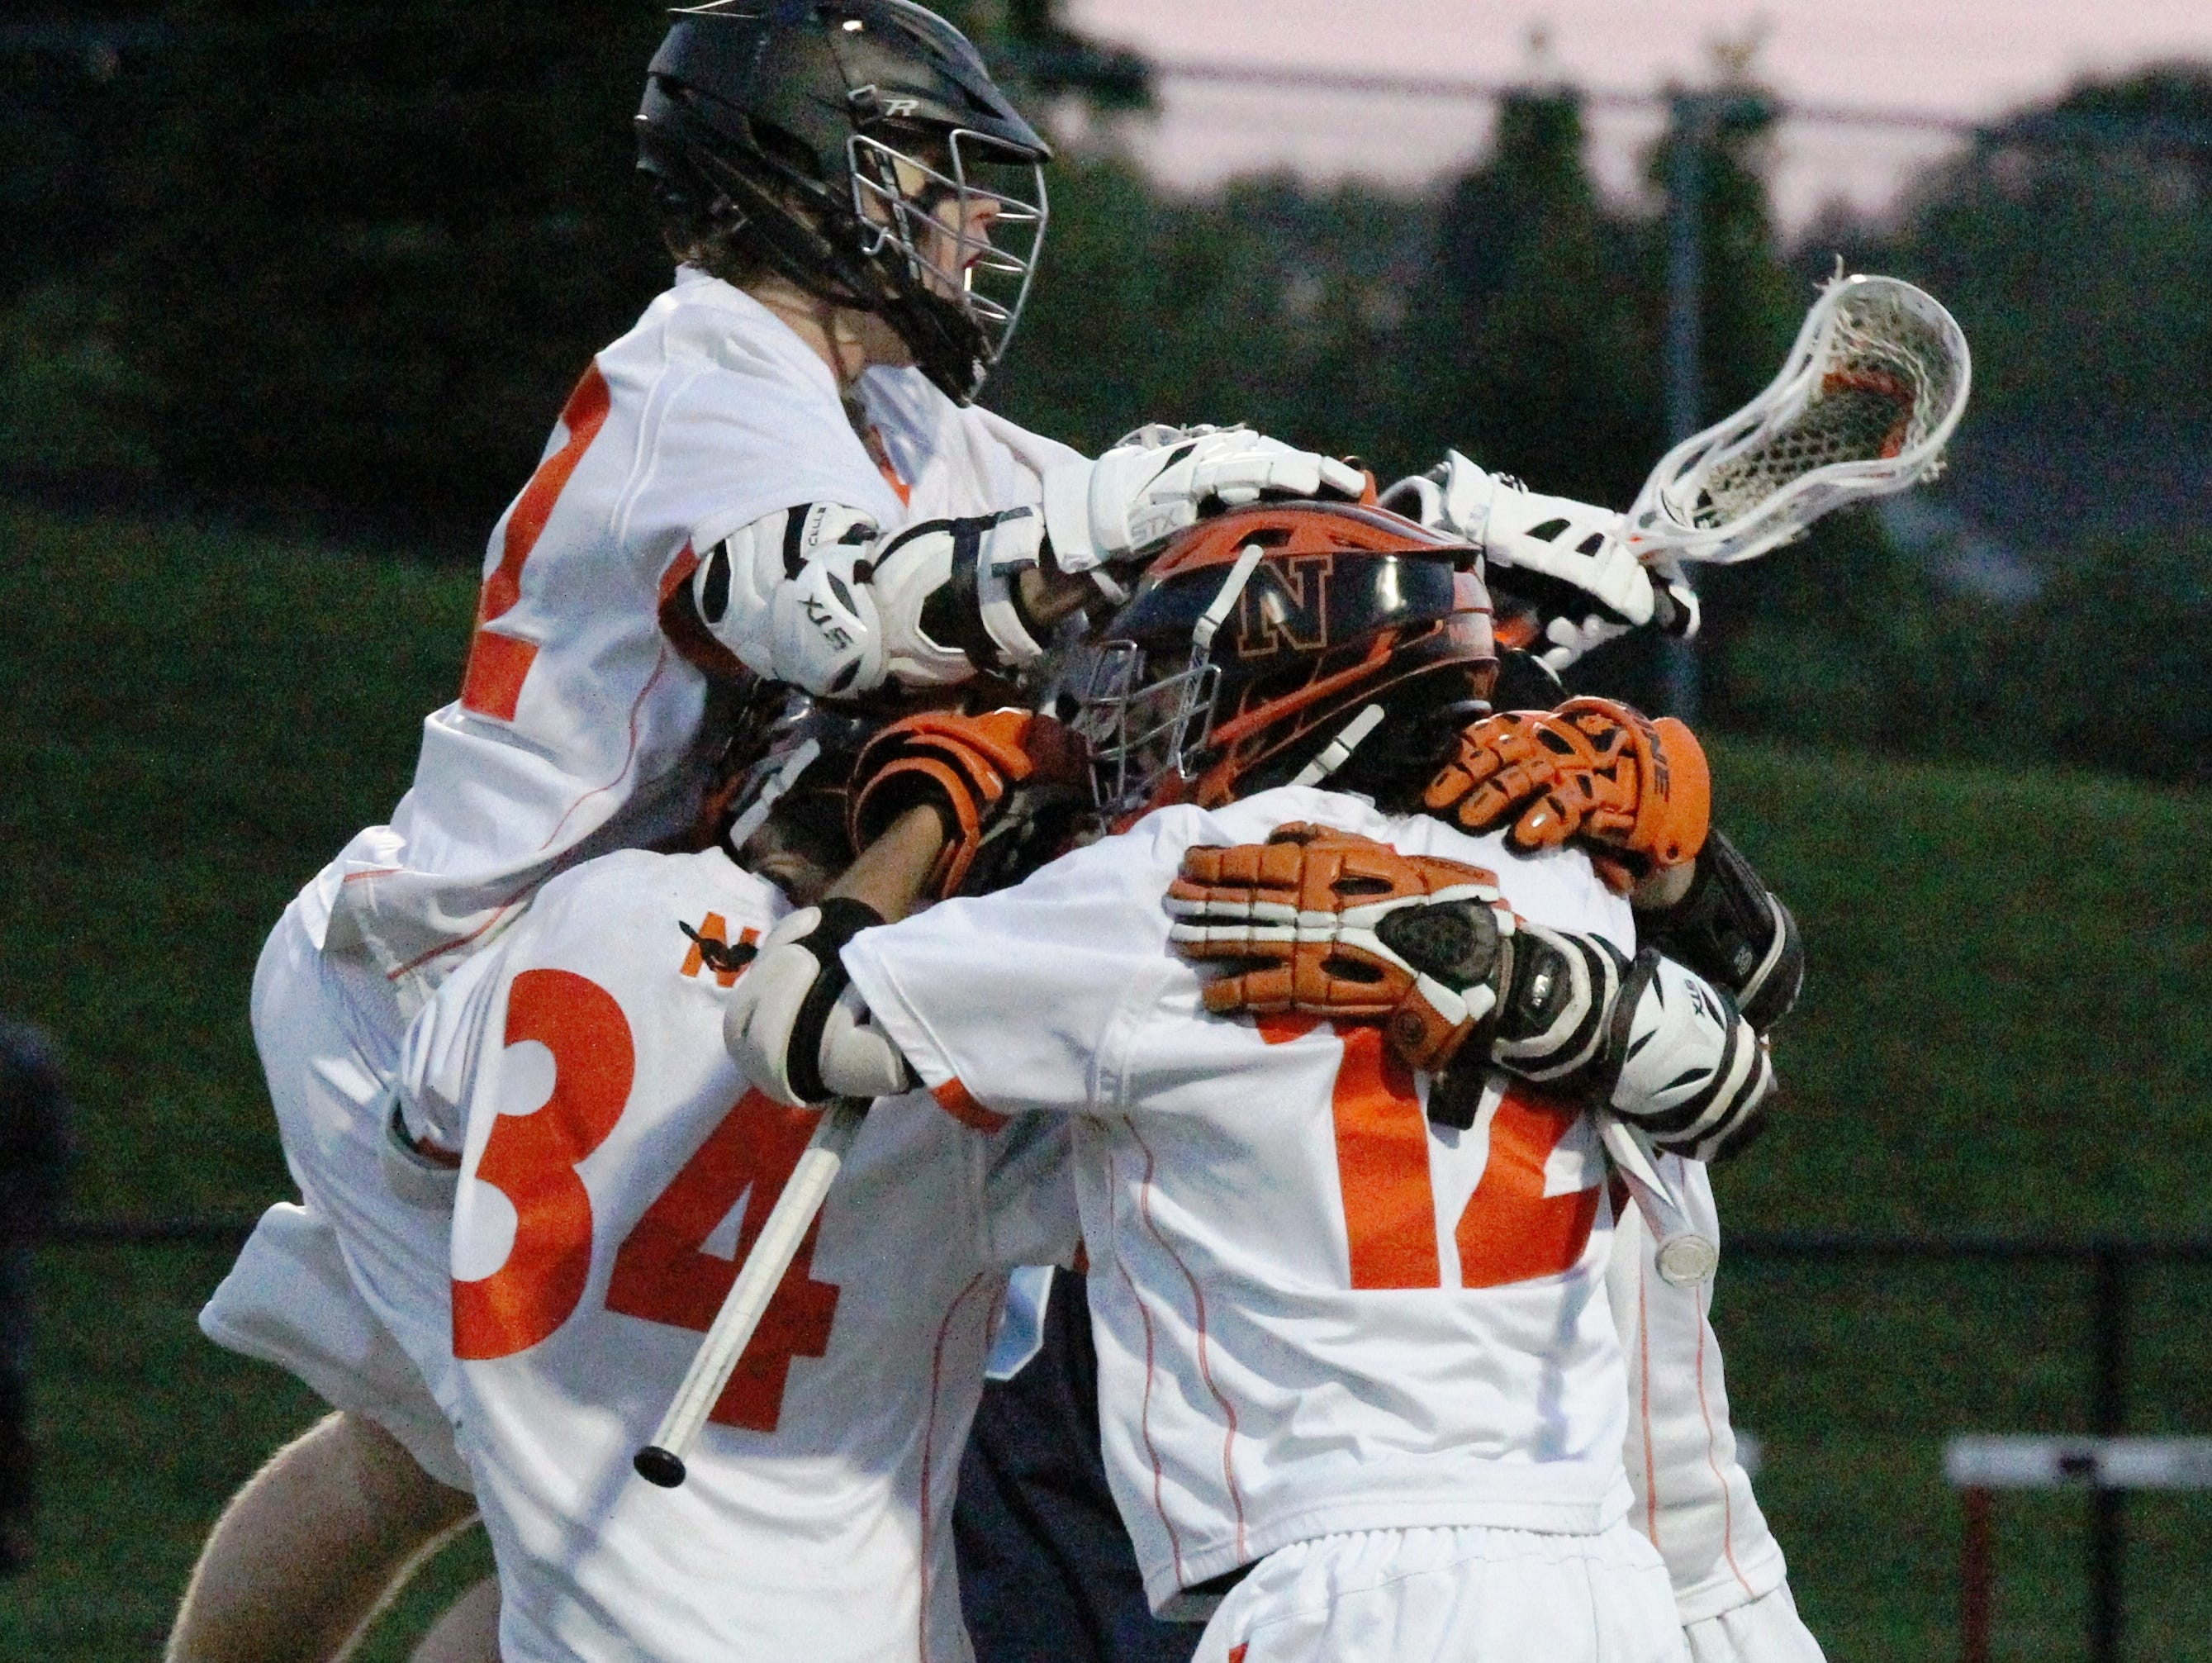 Northville players celebrate their regional semifinal win over Ann Arbor Skyline.